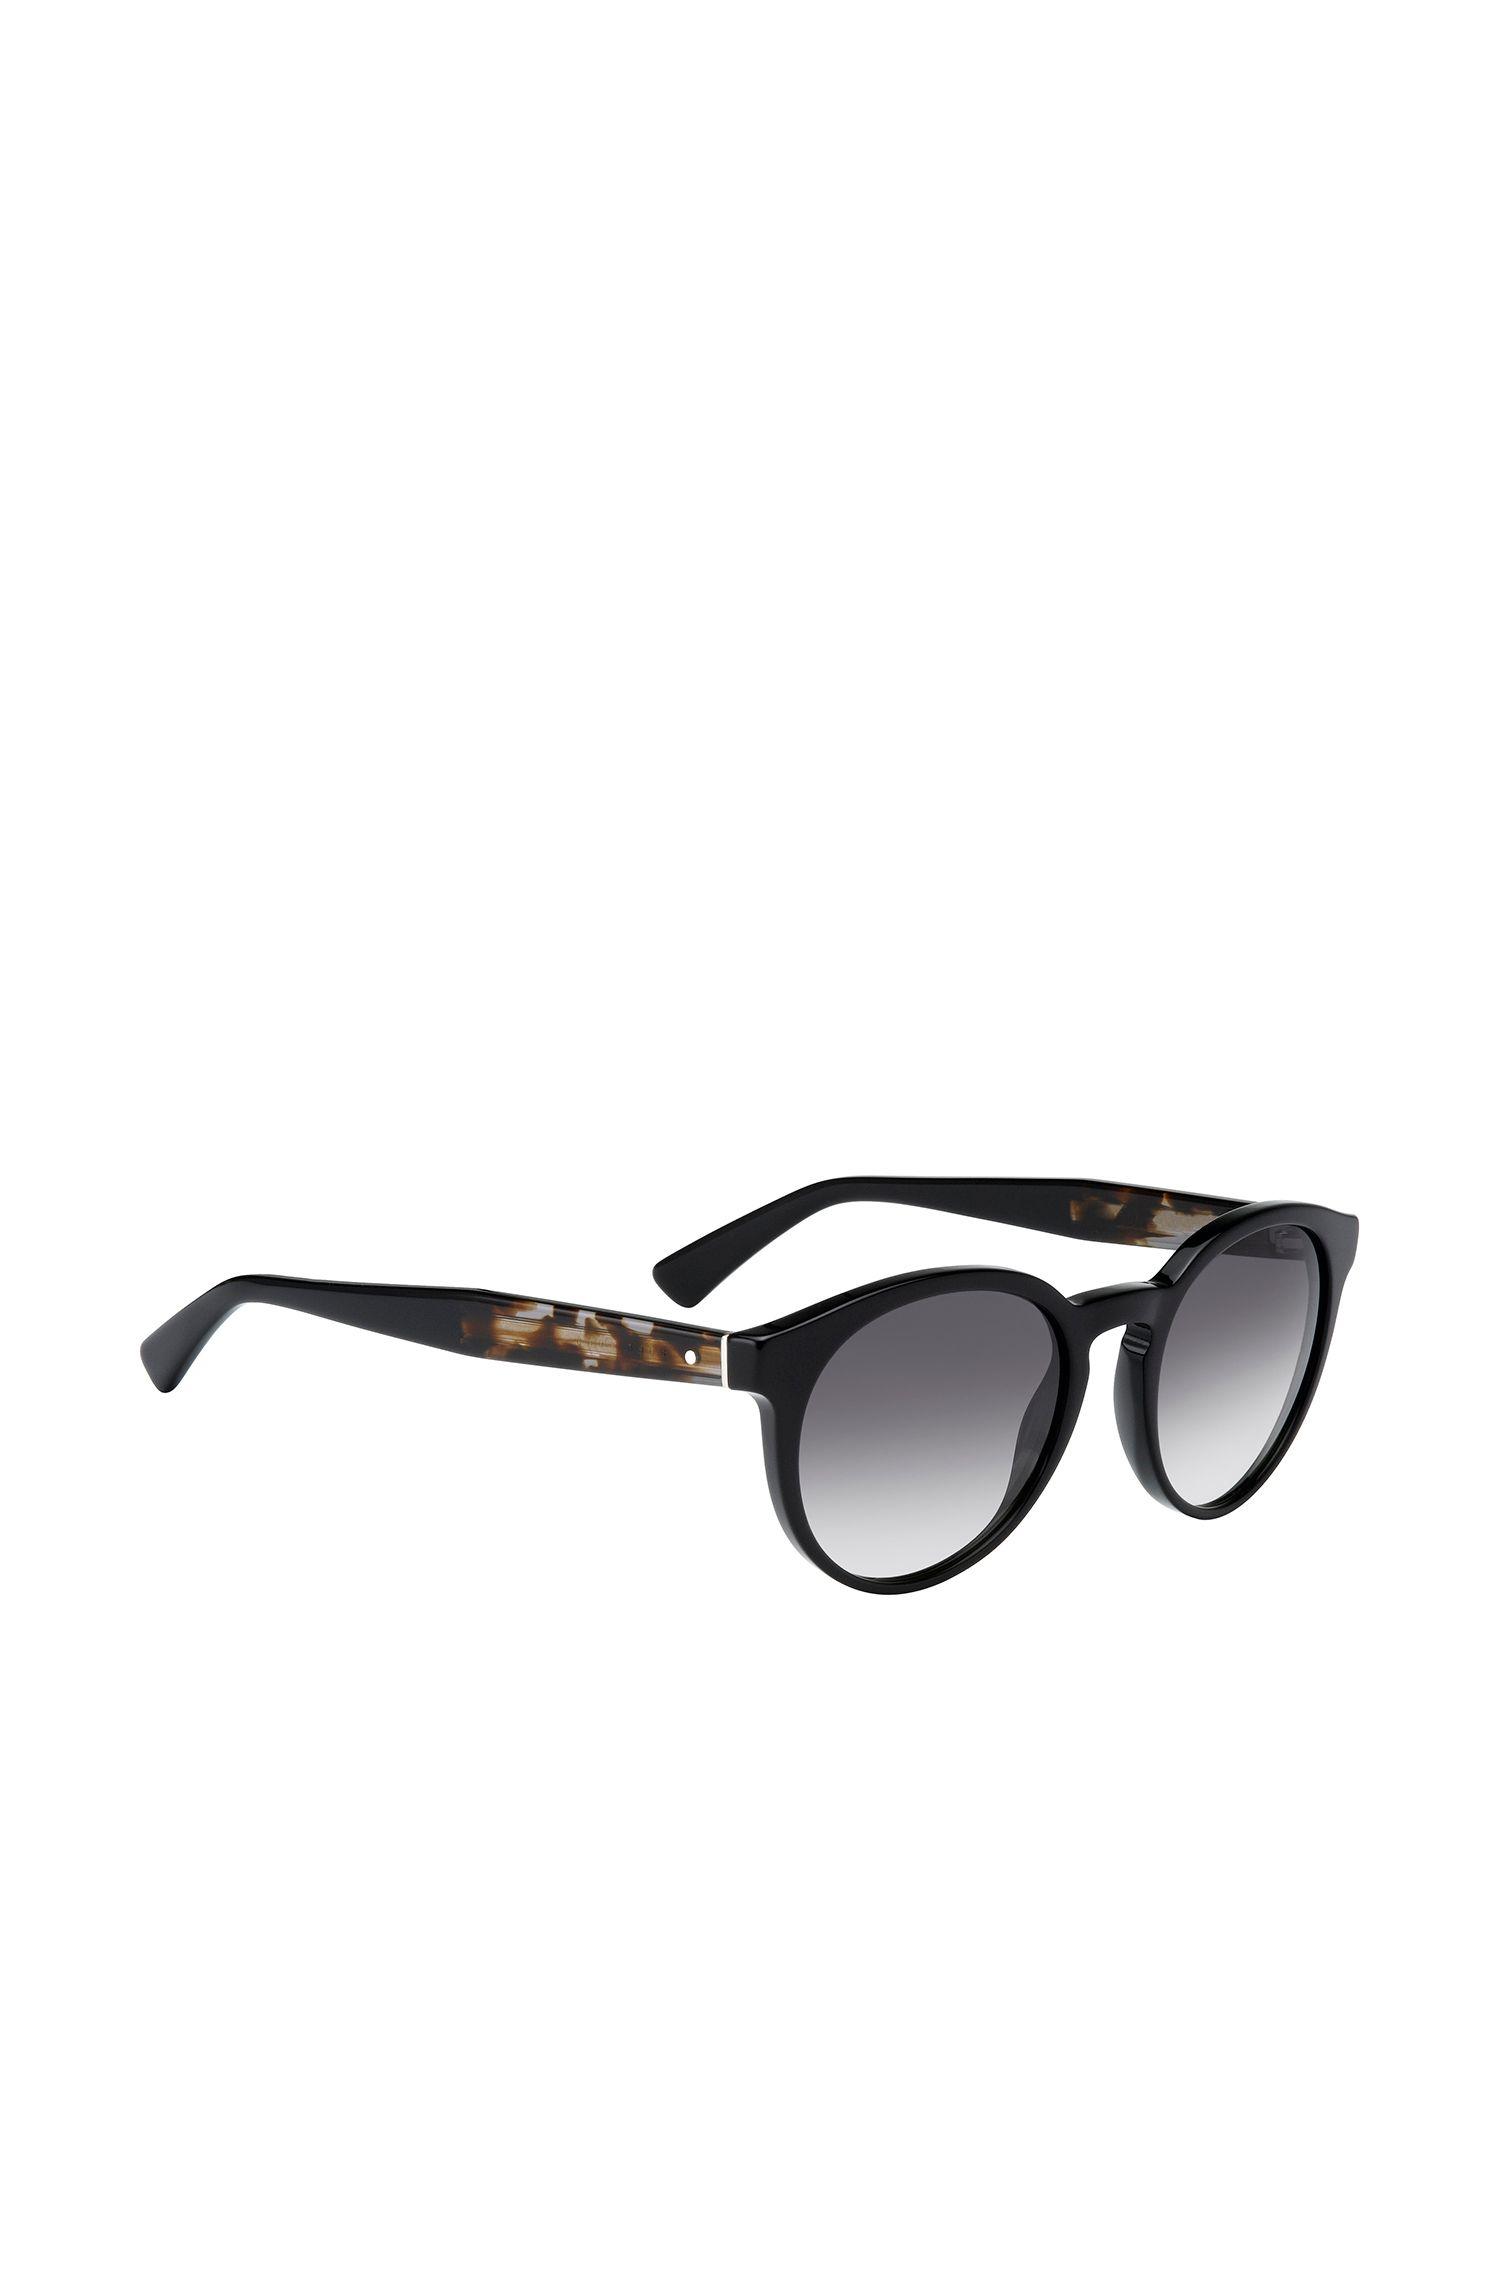 Gafas de sol negras de estilo Pantos: 'BOSS 0794/S'